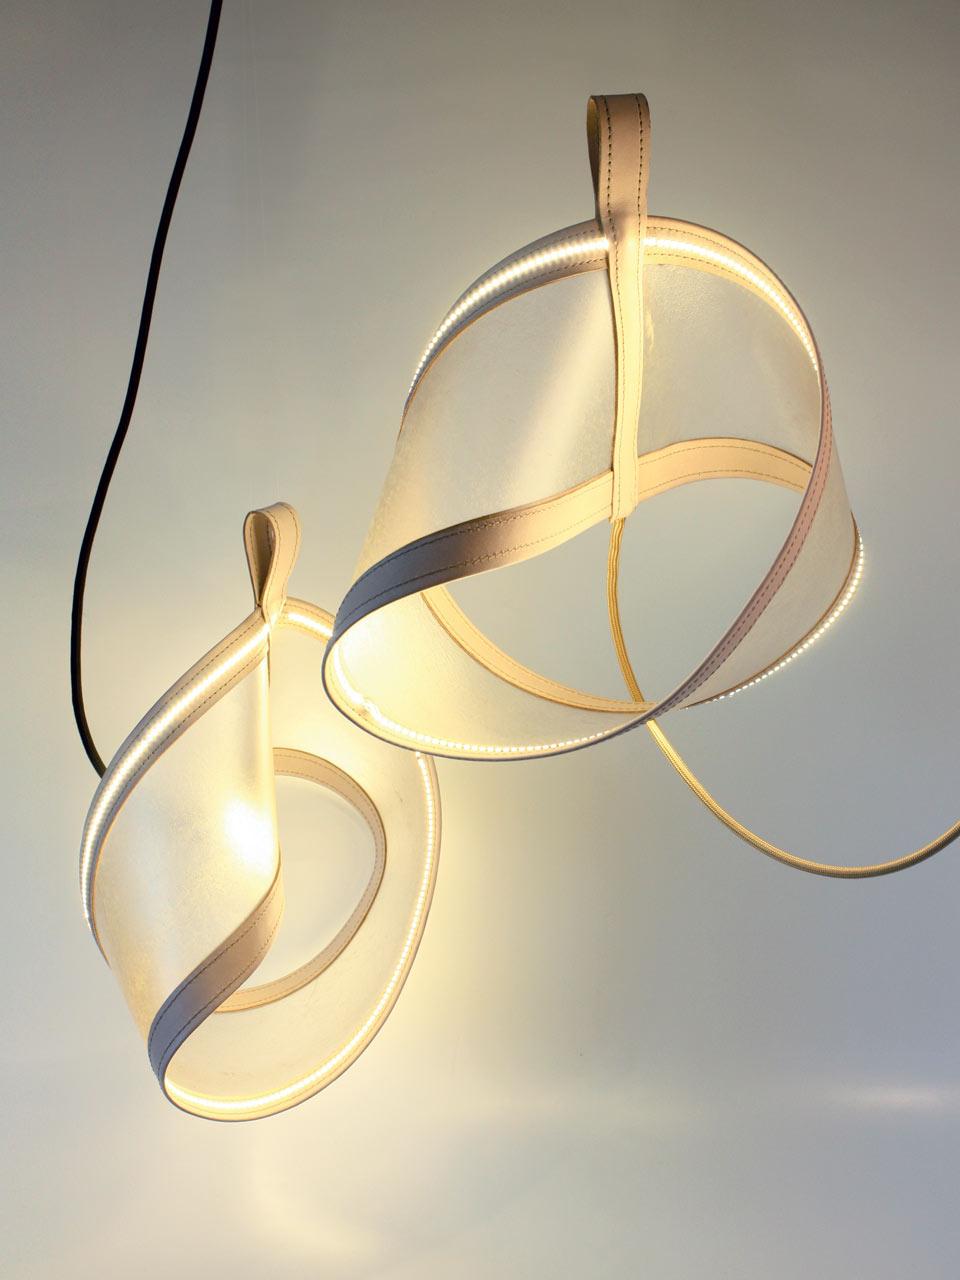 Moebius luminaire parchemin didier versavel